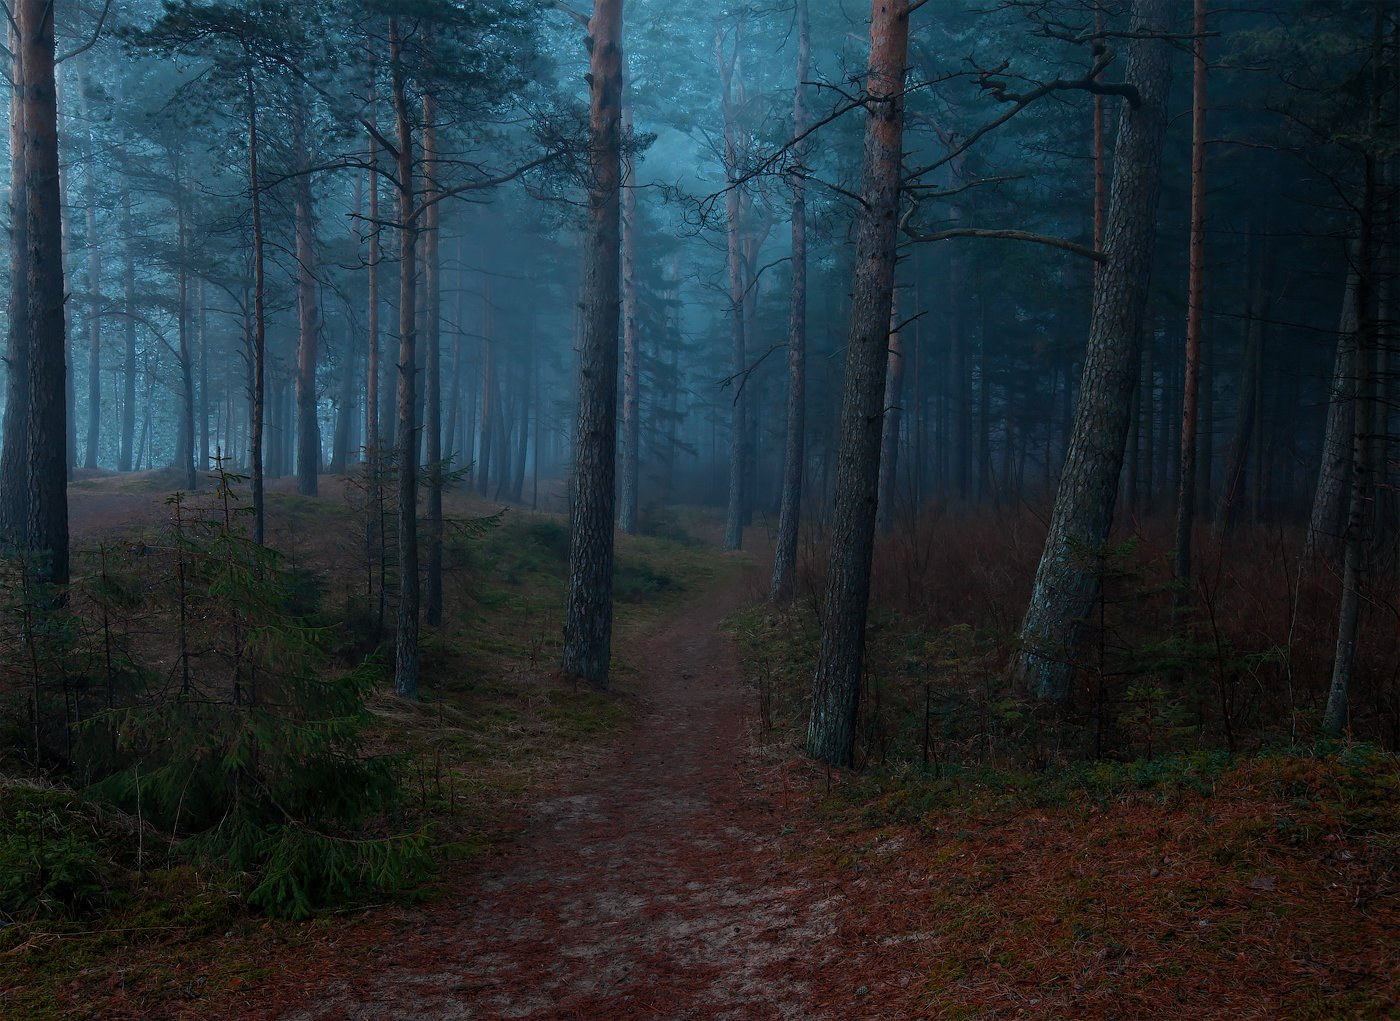 атмосфера, ключенков, лес, пейзаж, туман, эстония, Kljuchenkow Aleksandr